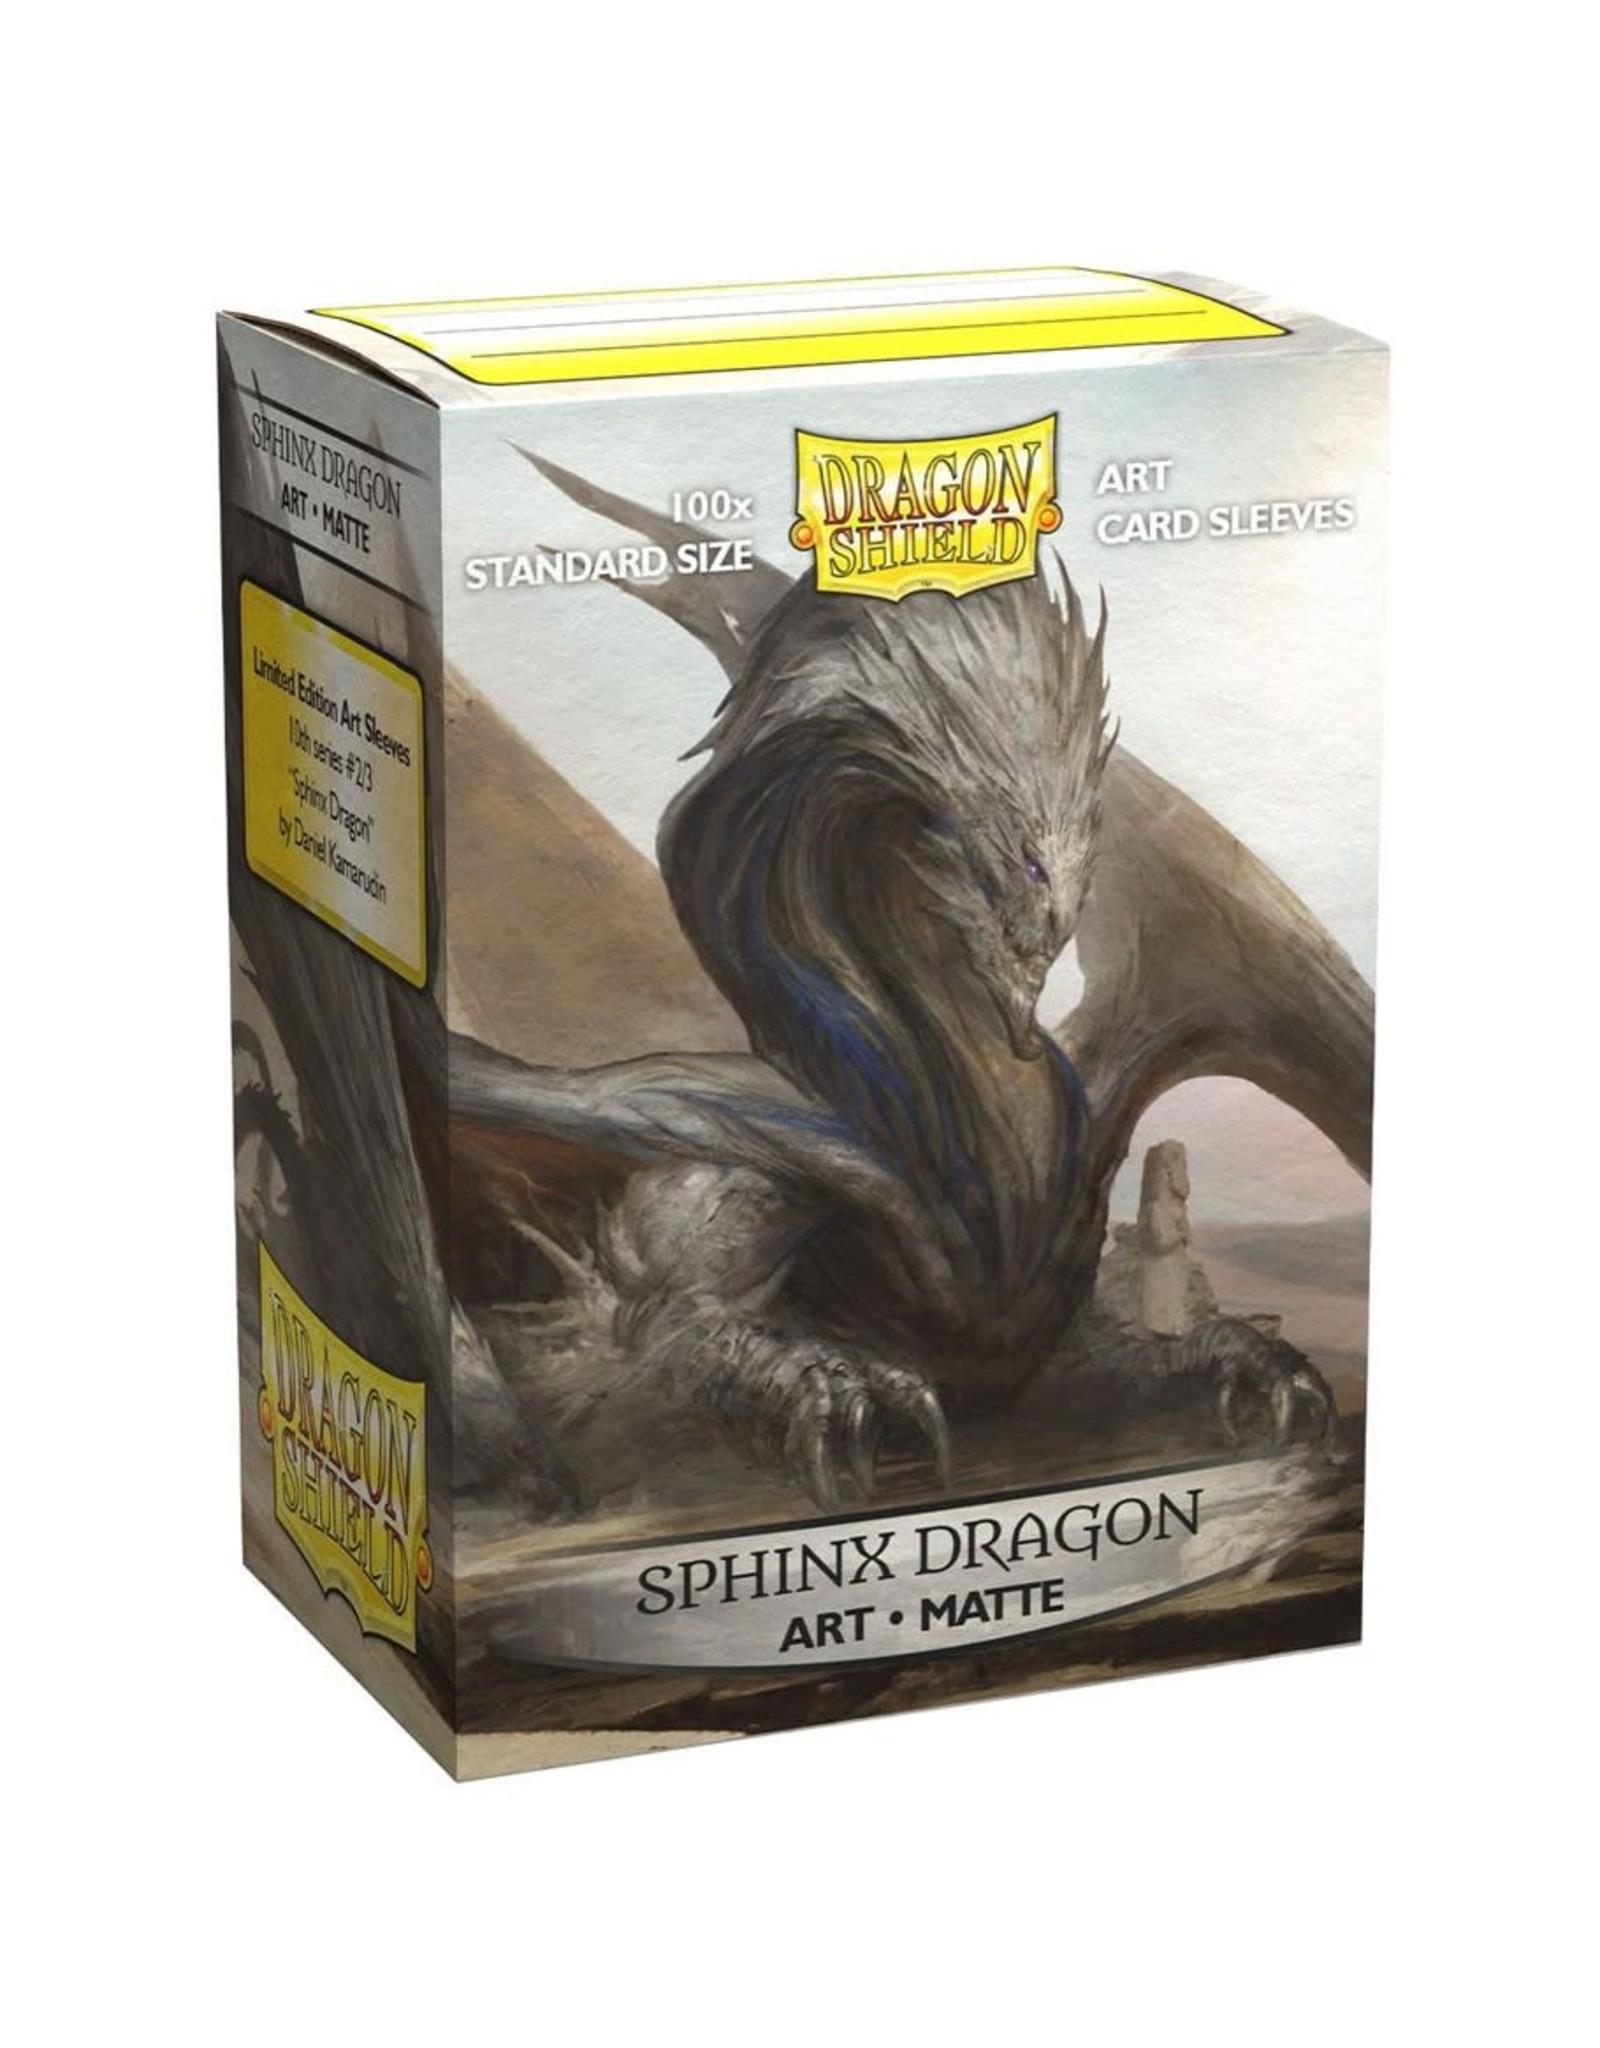 Matte Art Dragon Shields: Sphinx Dragon